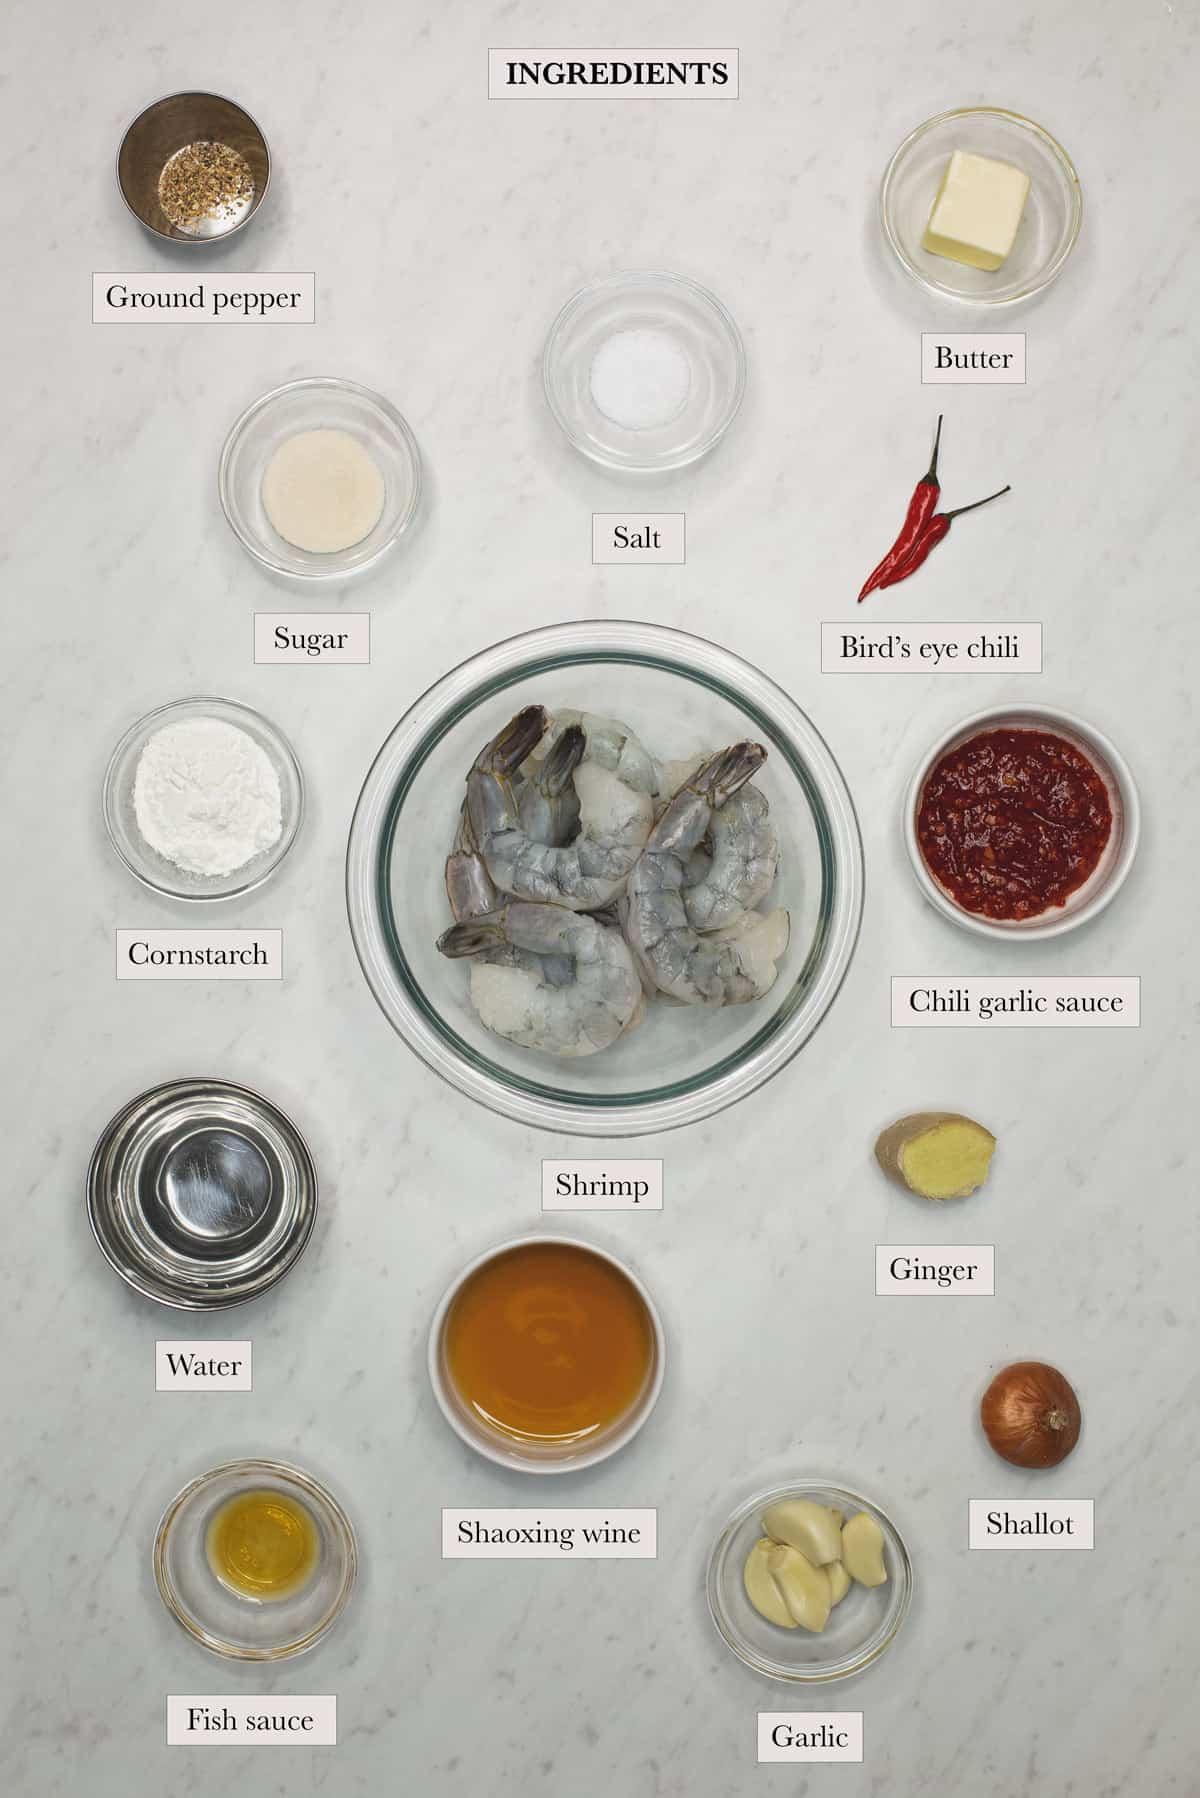 ingredients include ground pepper, butter, sugar, salt, Bird's eye chili, cornstarch, shrimp, chili garlic sauce, water, Shaoxing wine, ginger, fish sauce, garlic, and shallot